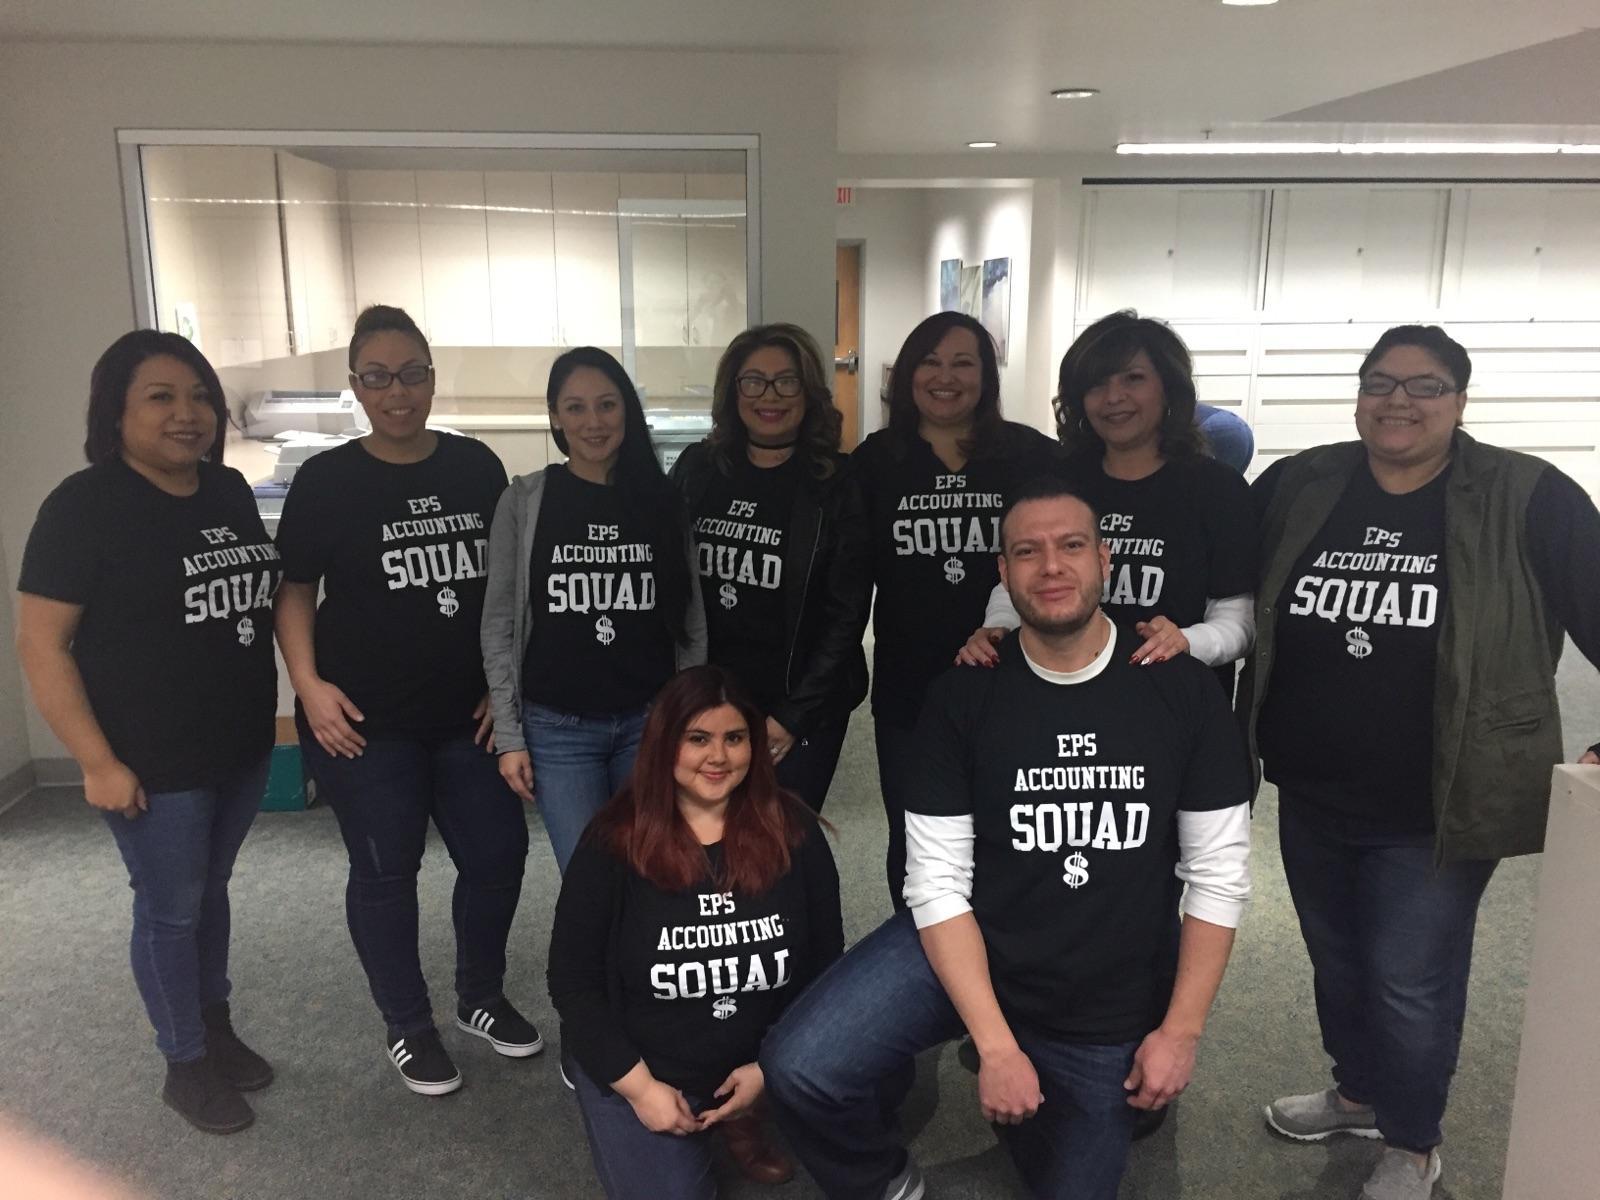 Accounting Squad T Shirt Photo